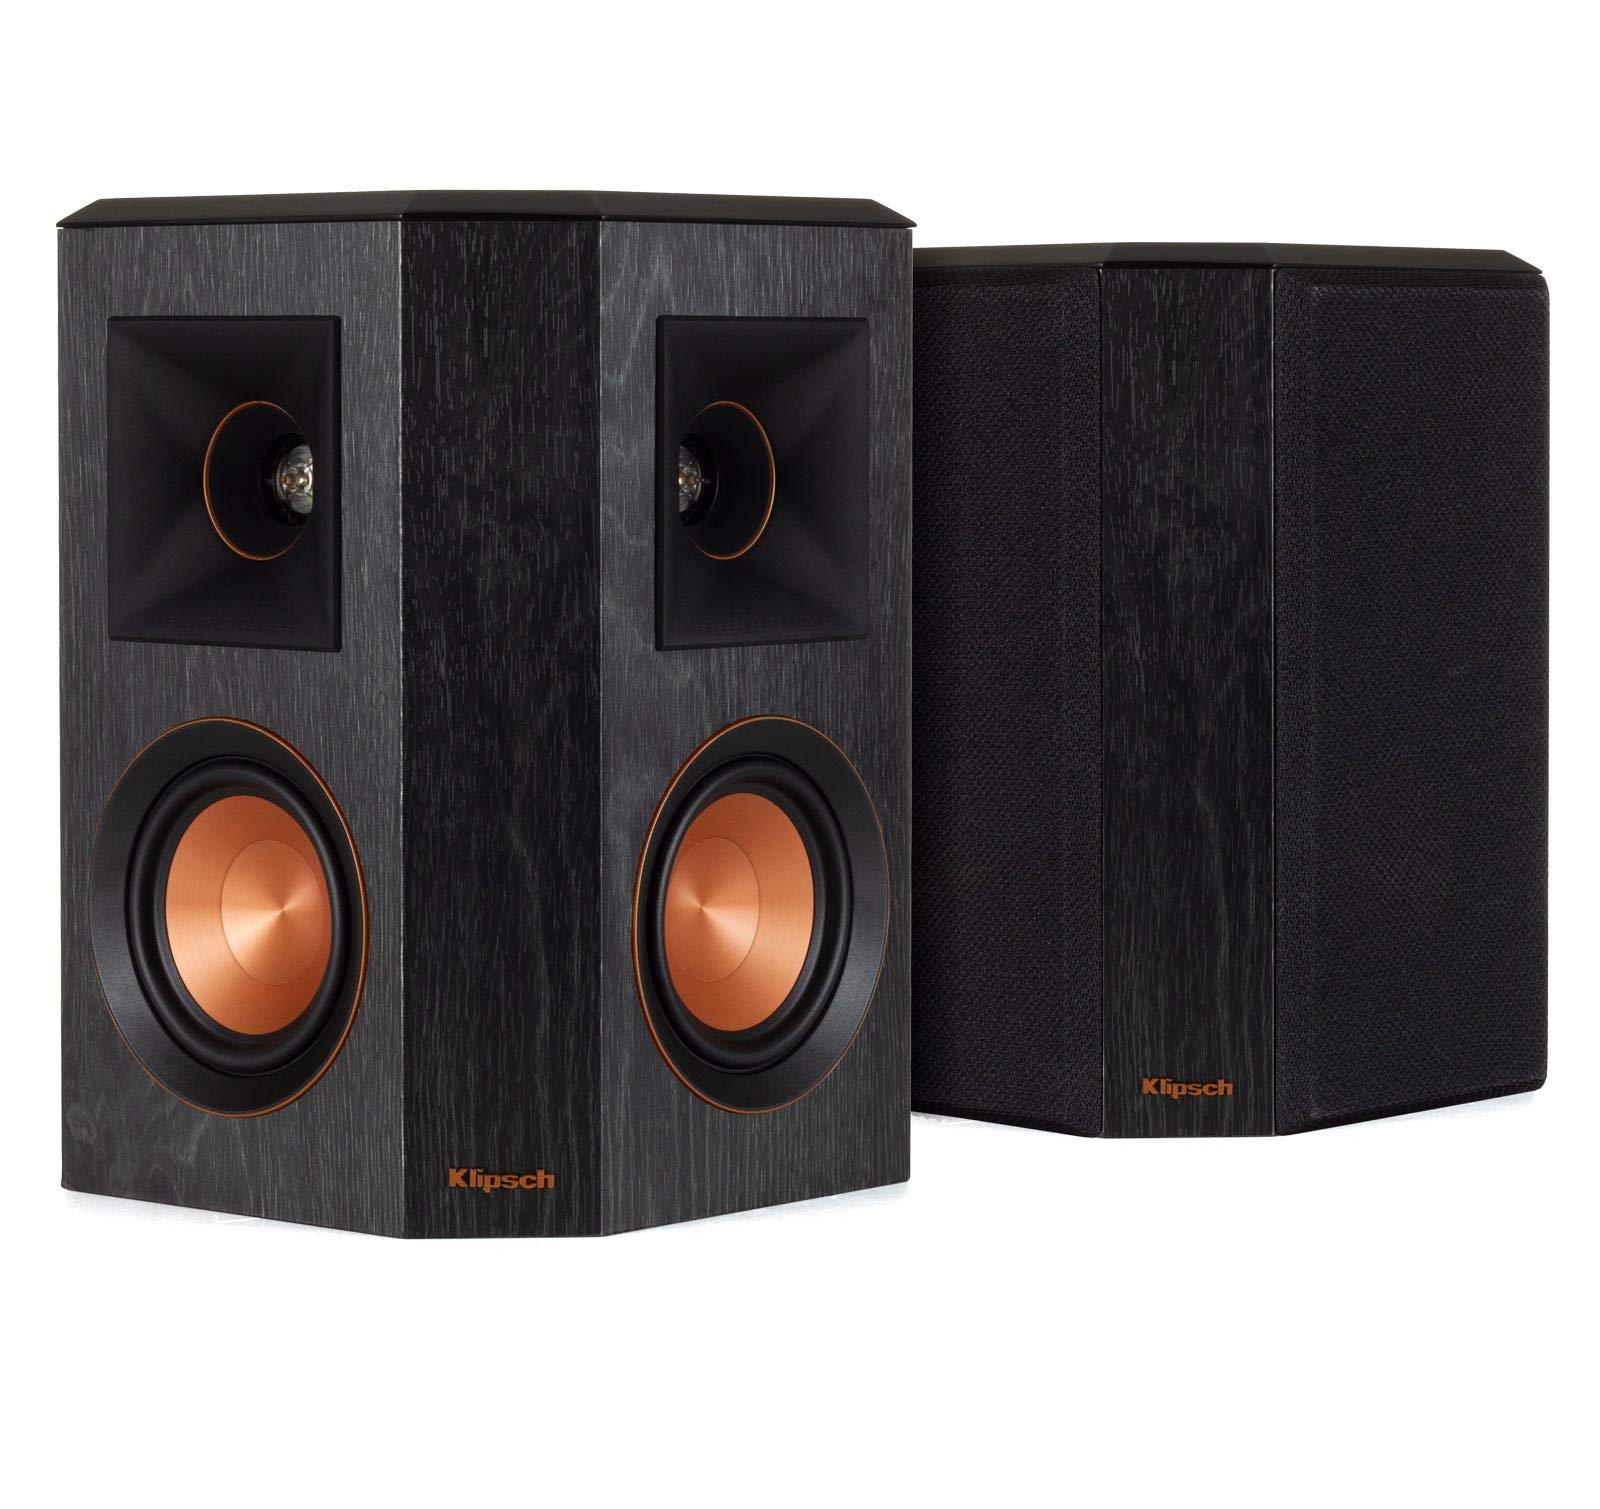 Klipsch RP-402S Reference Premiere Surround Speakers - Pair (Ebony) (Renewed) by Klipsch